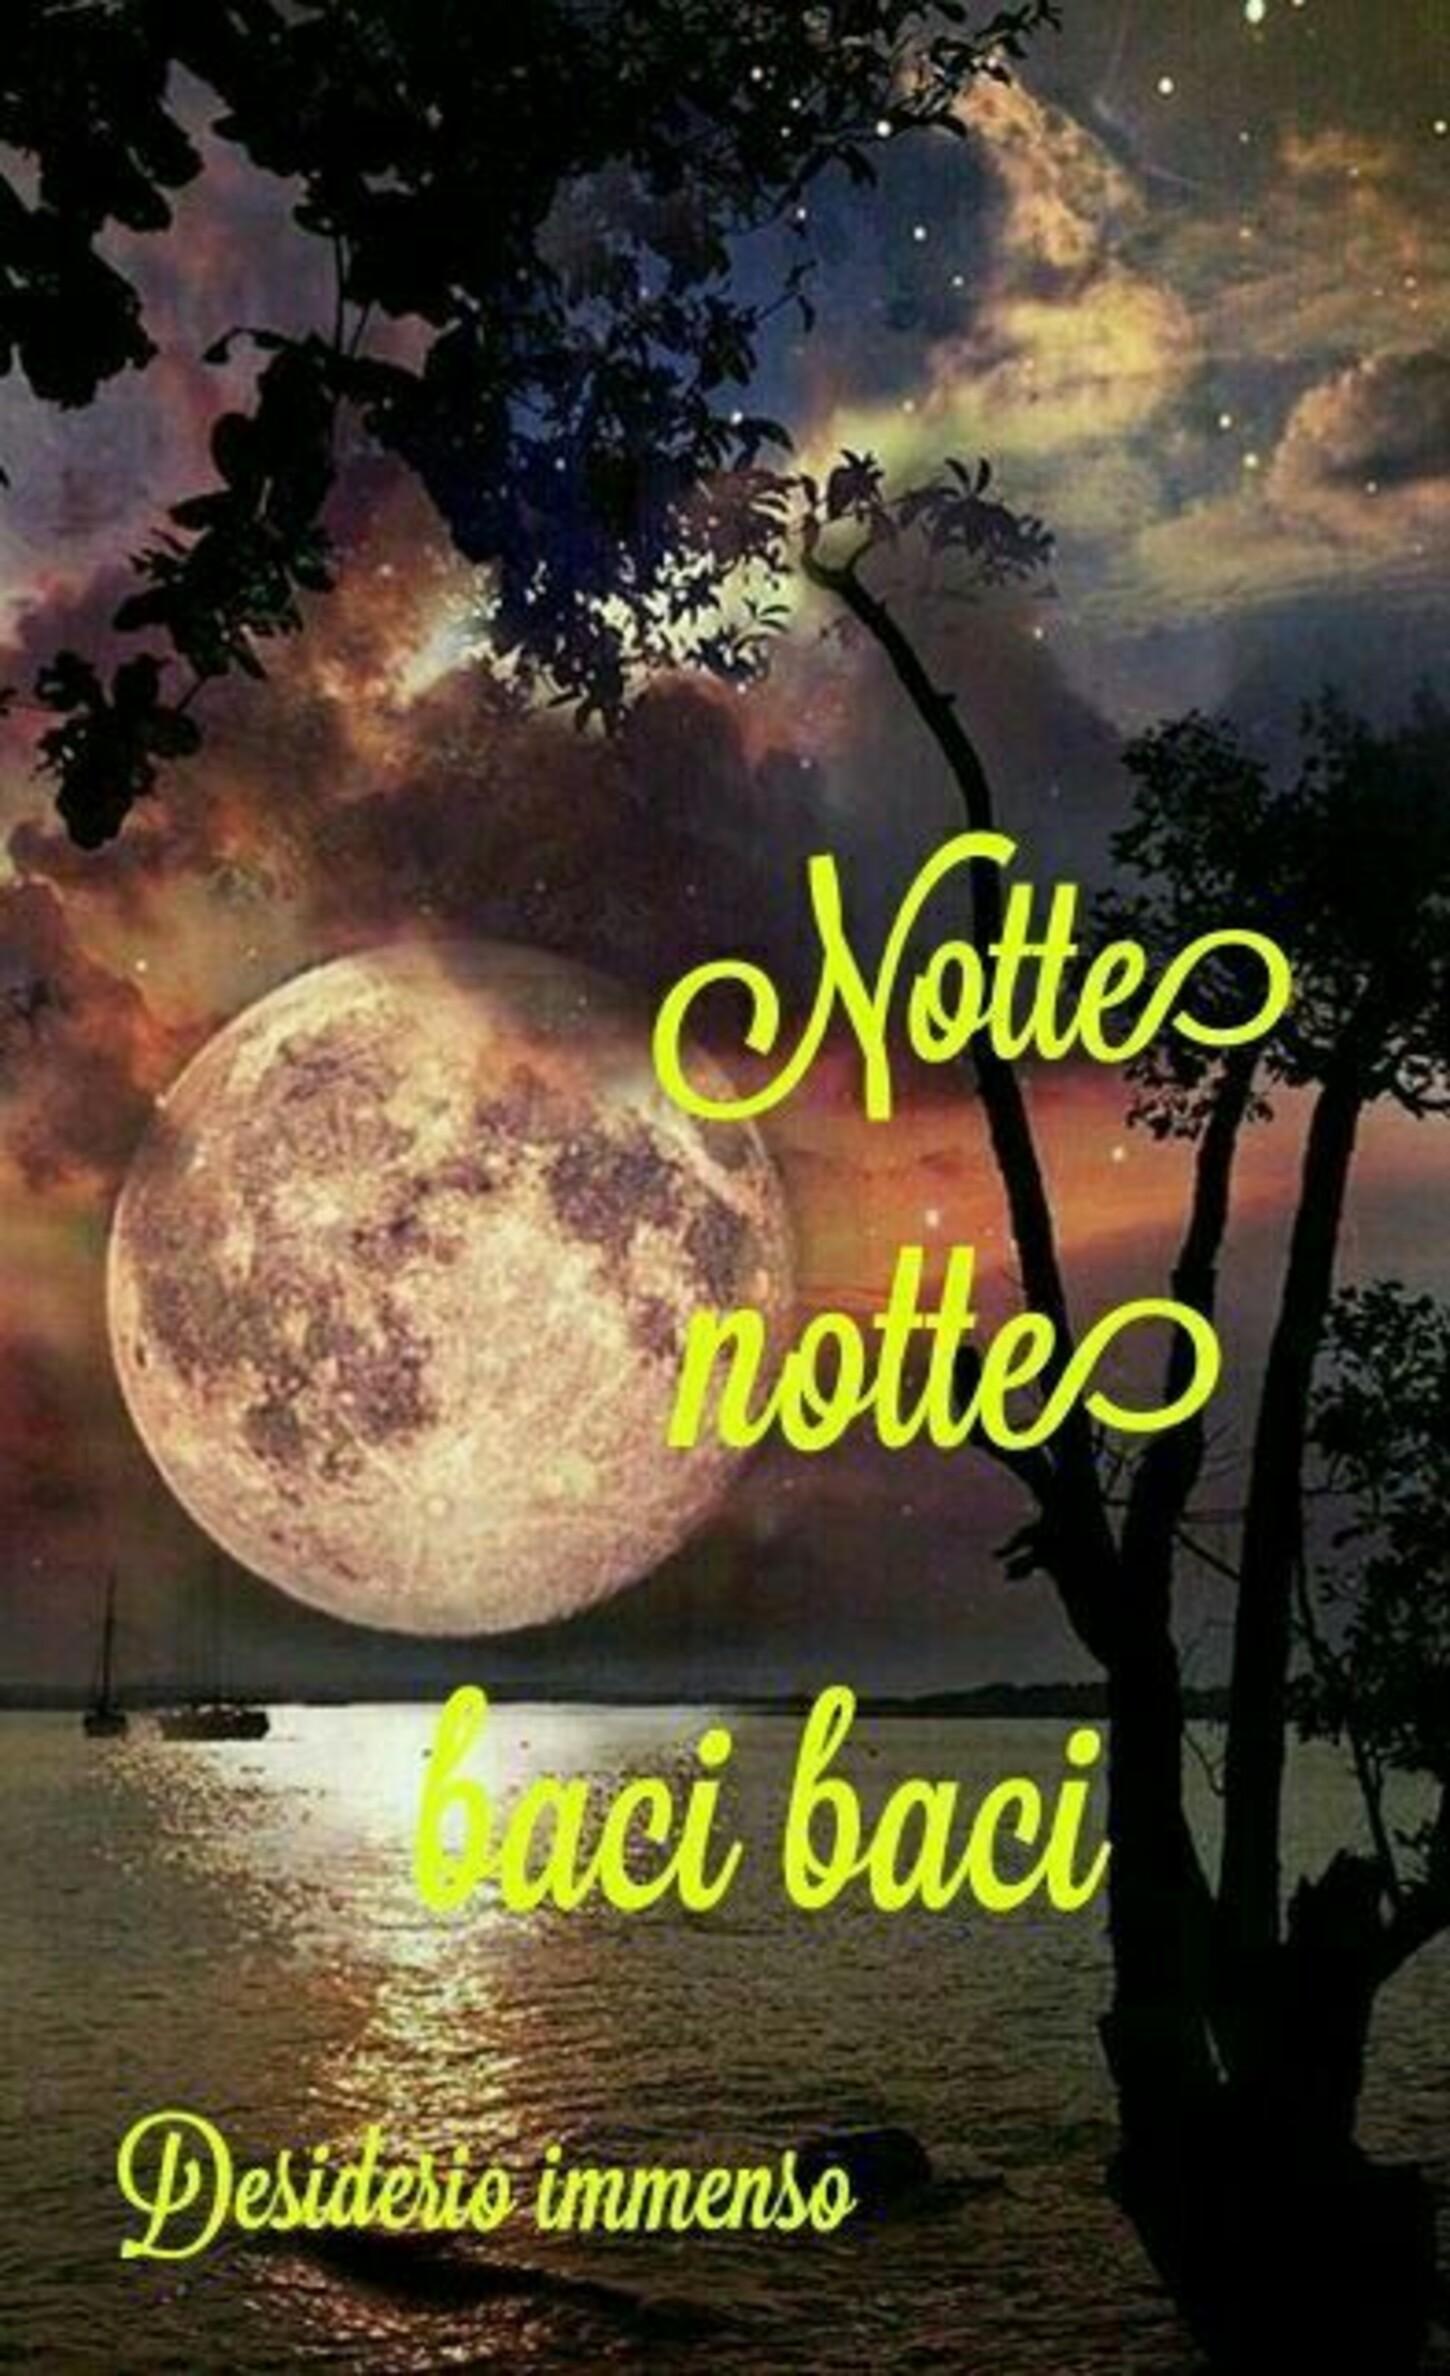 Notte notte baci baci